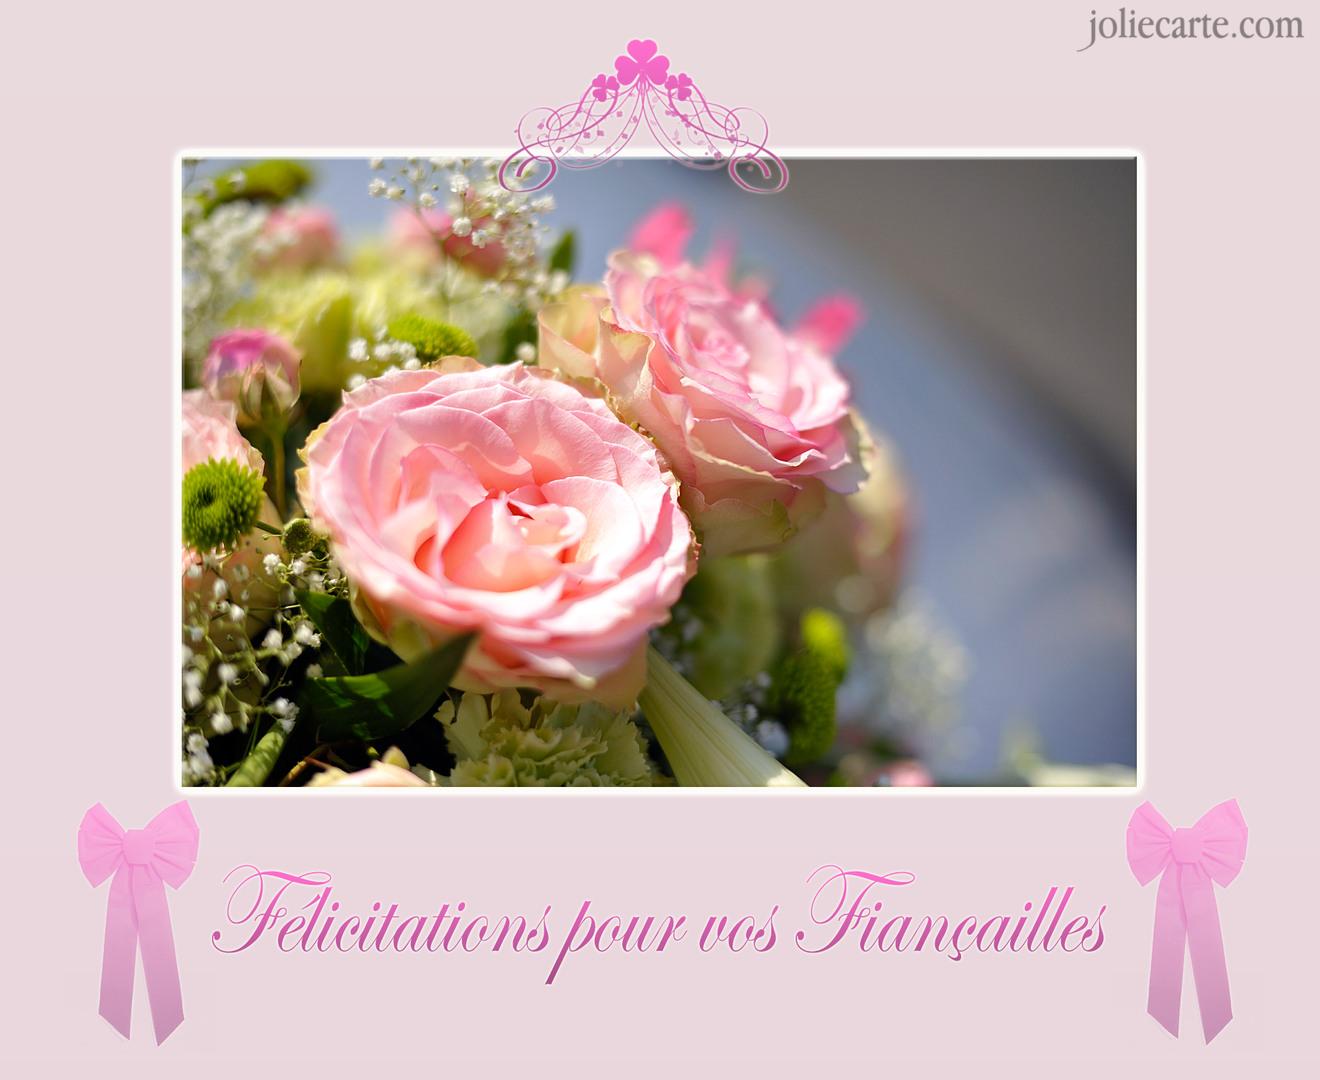 Felicitations_fiancailles